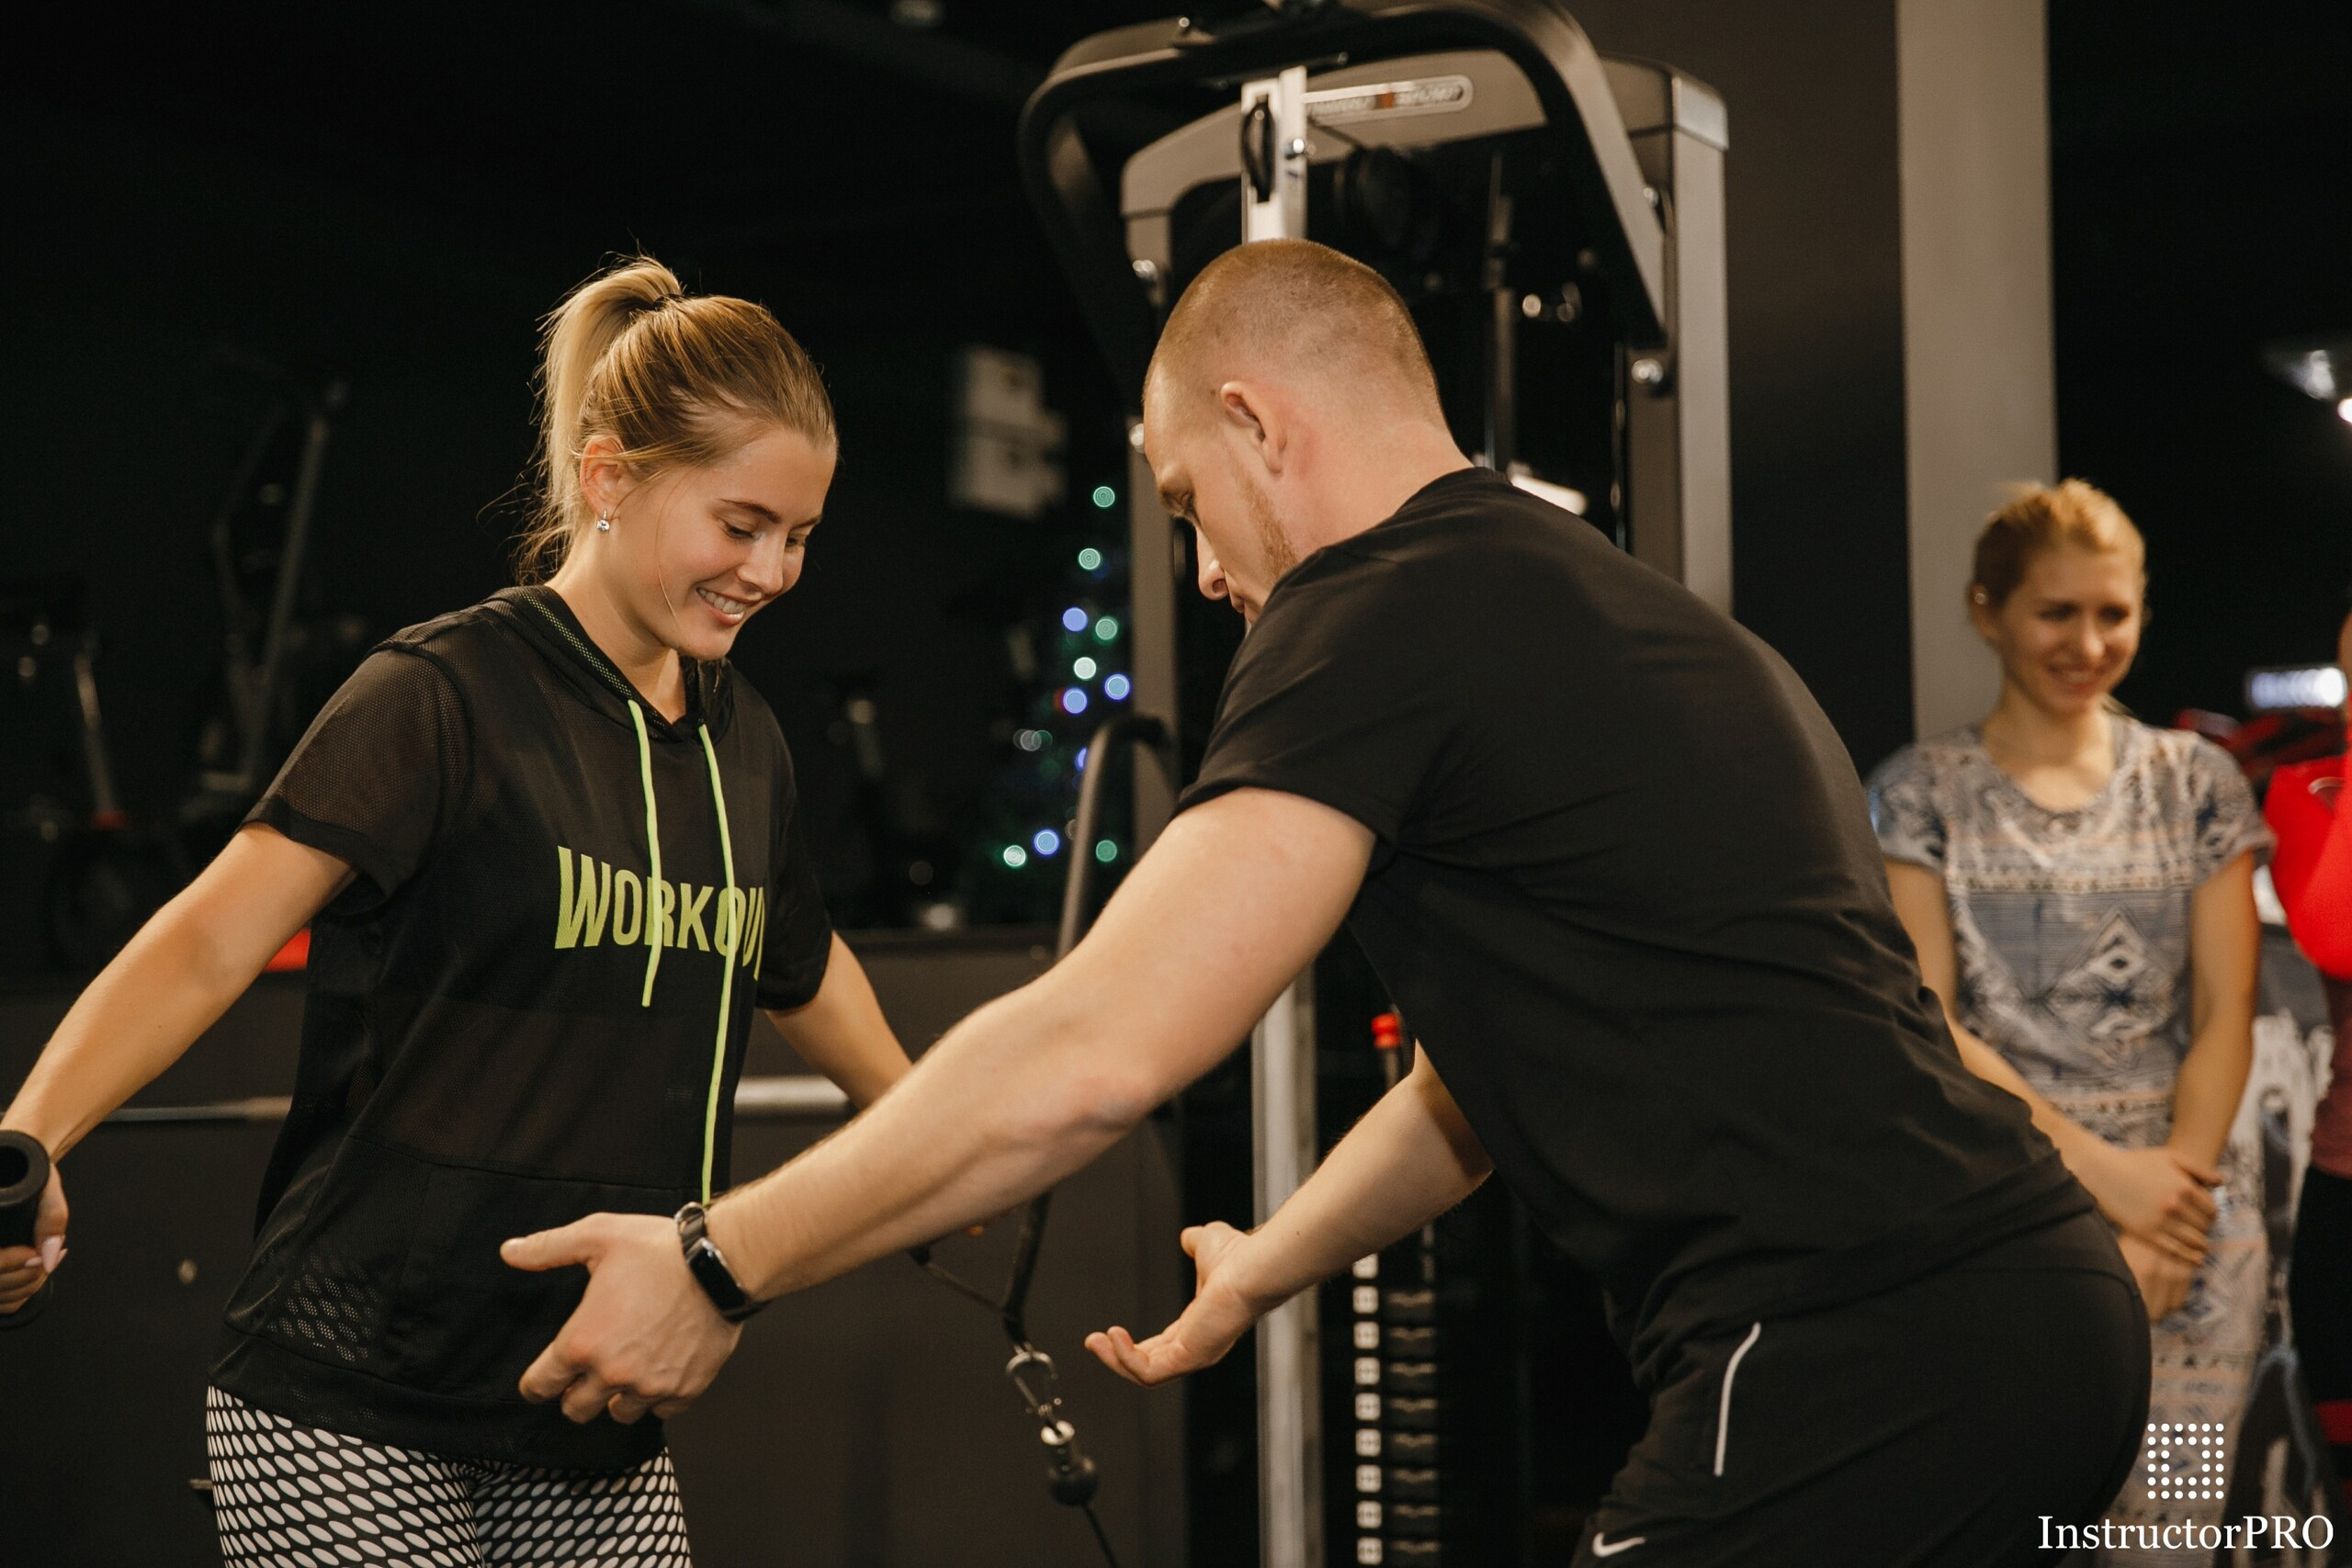 фитнес инструктор обучение онлайн